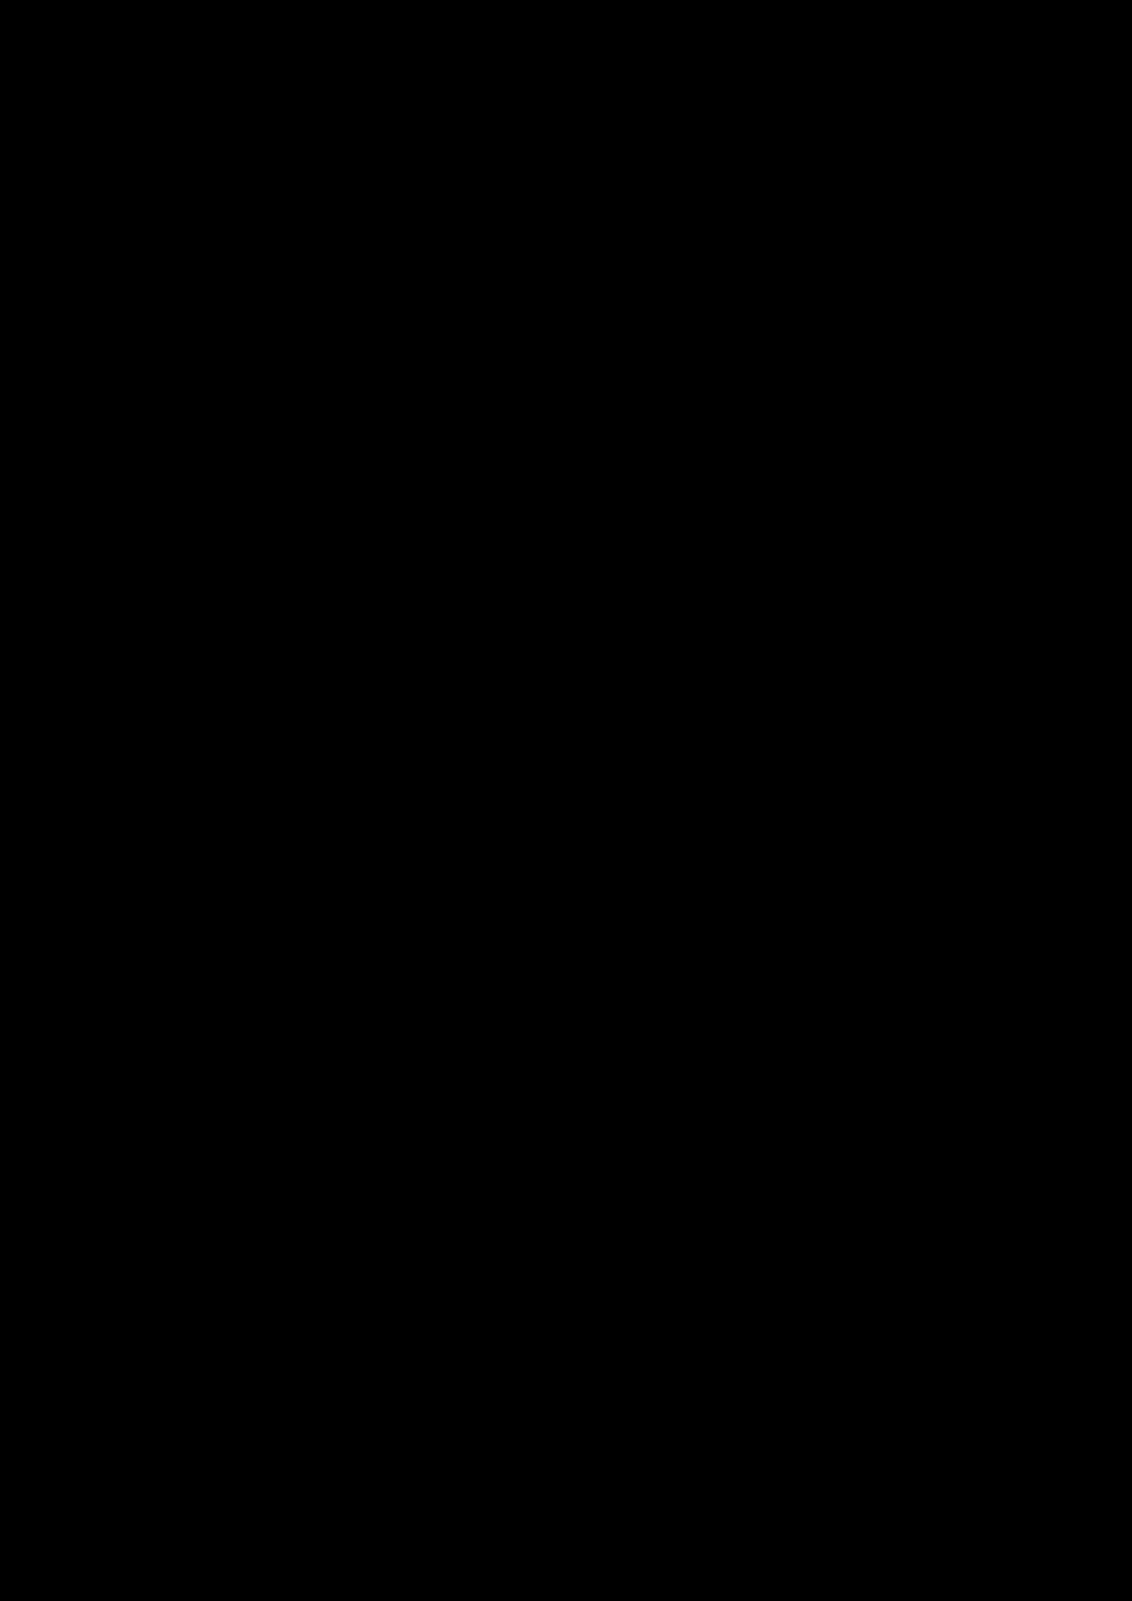 Prosti slide, Image 14